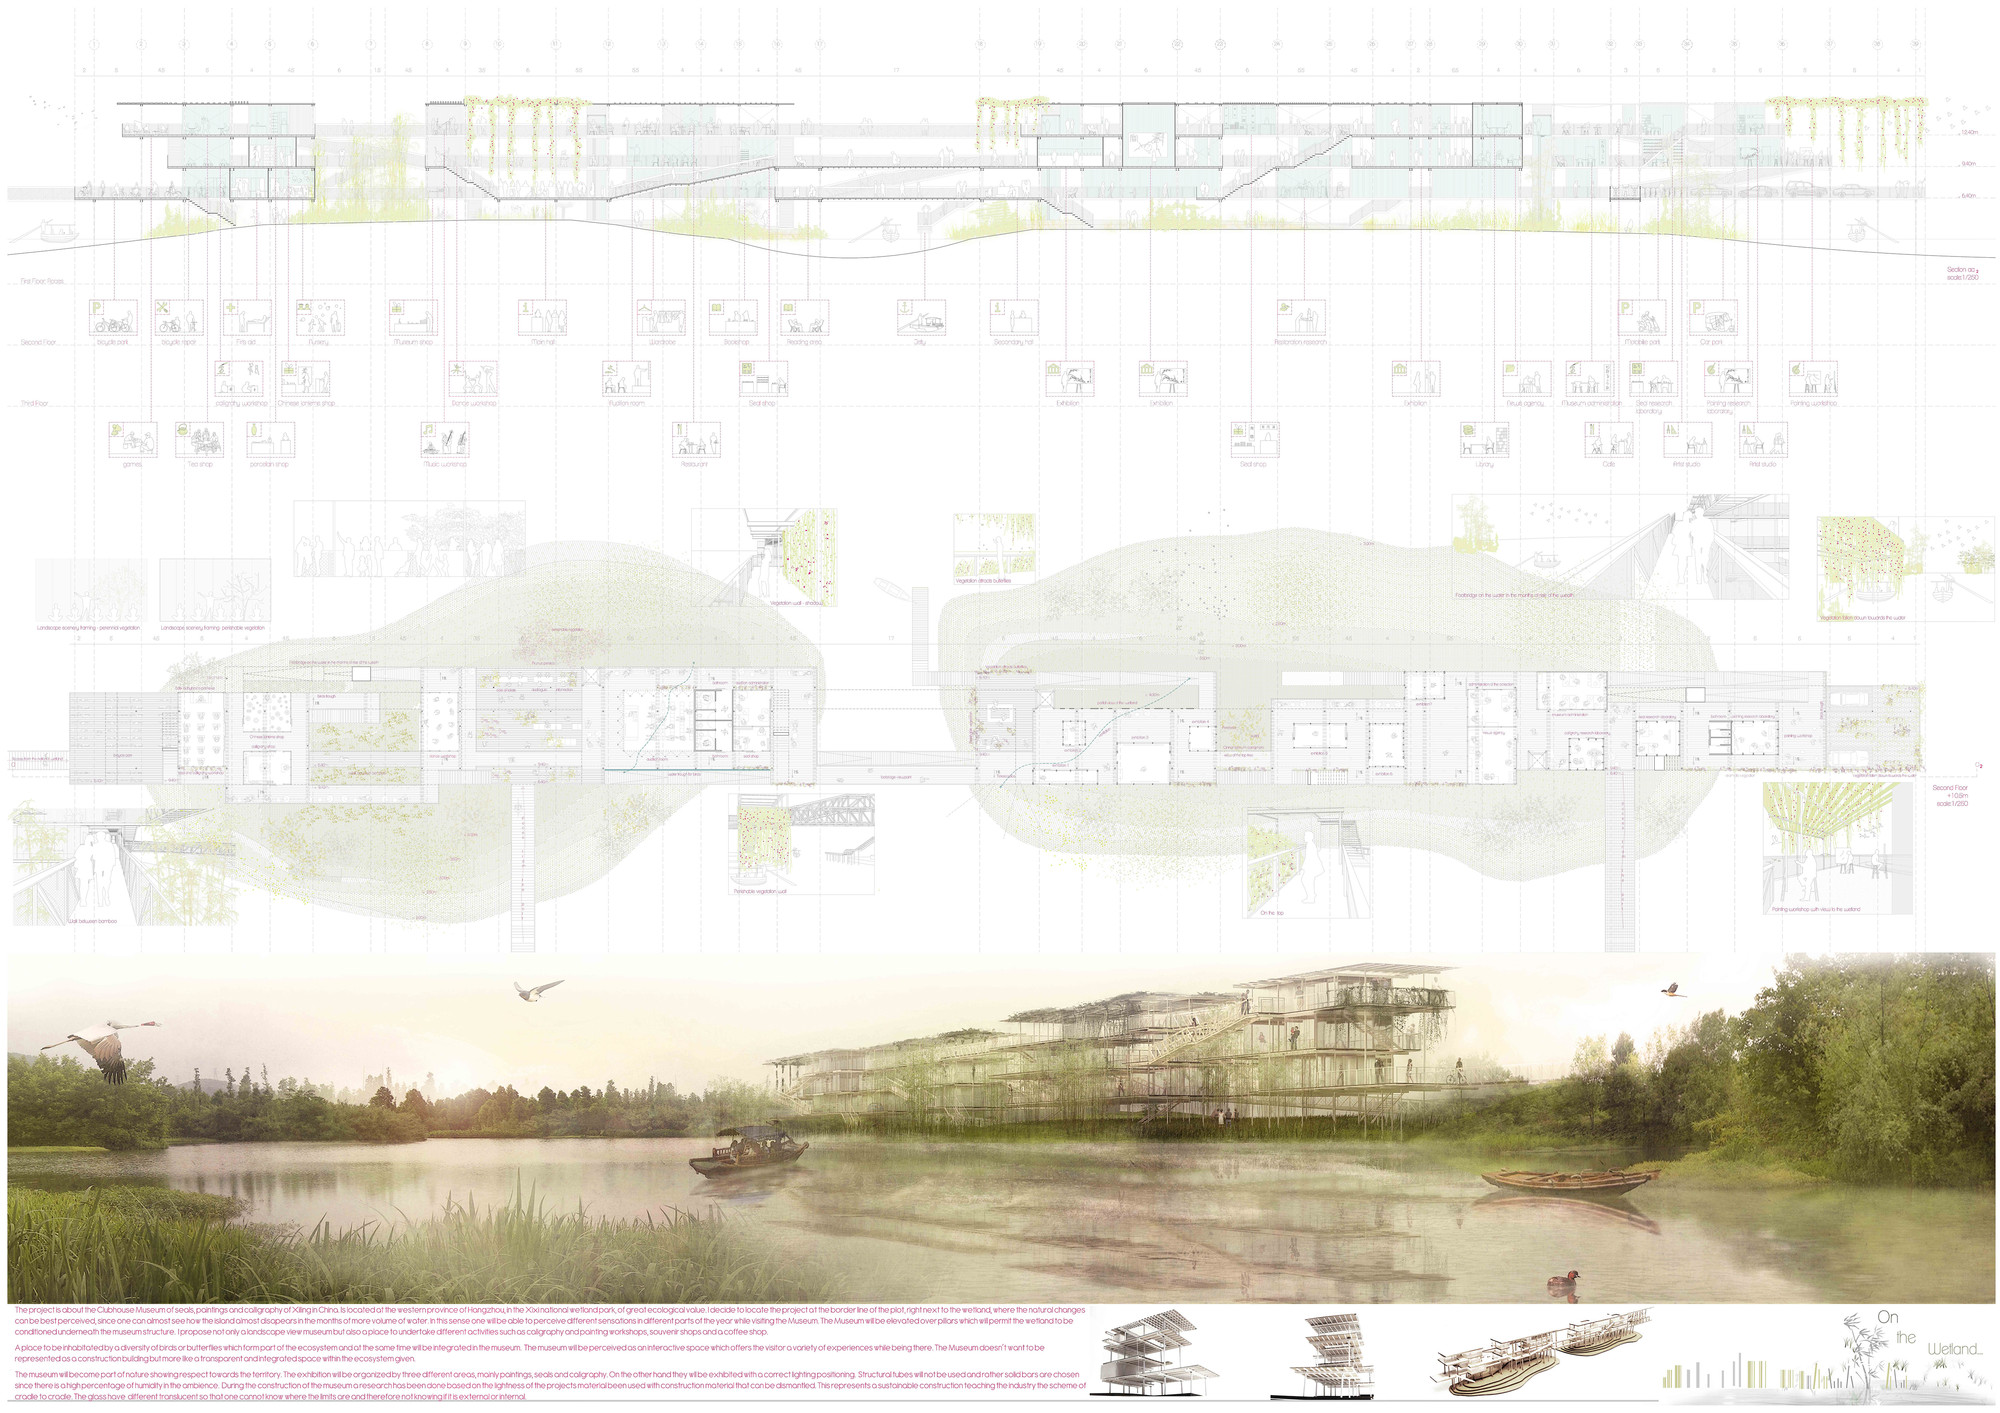 Mención Honrosa: On the wetland. Image Courtesy of IS ARCH